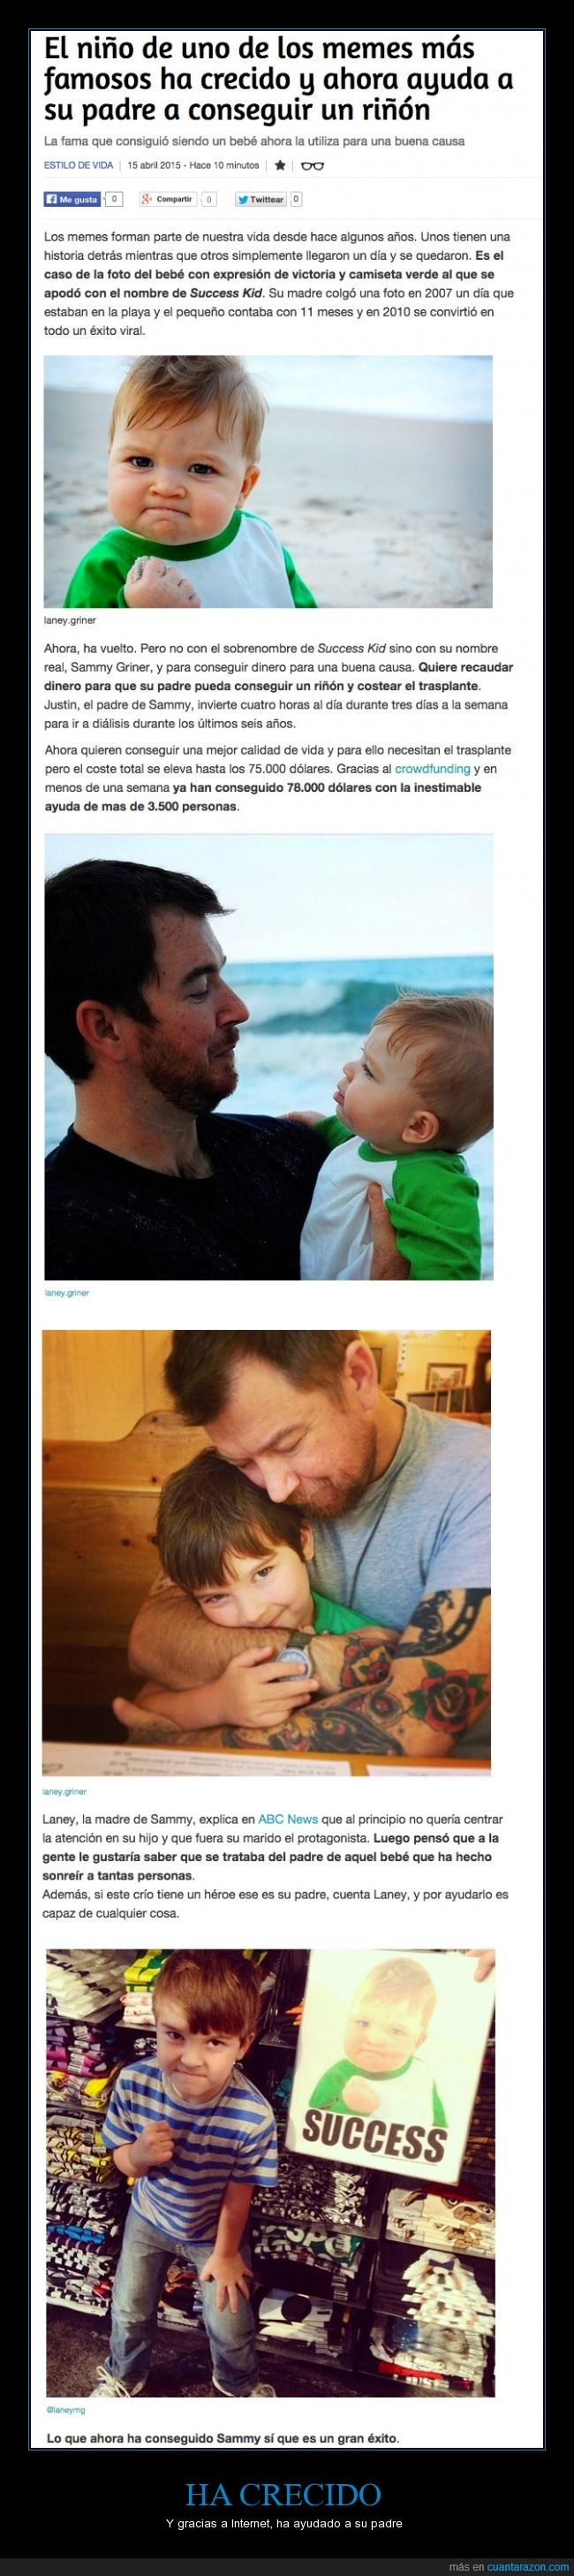 ayuda,crecer,crecido,niño,padre,riñon,Sammy,success kid